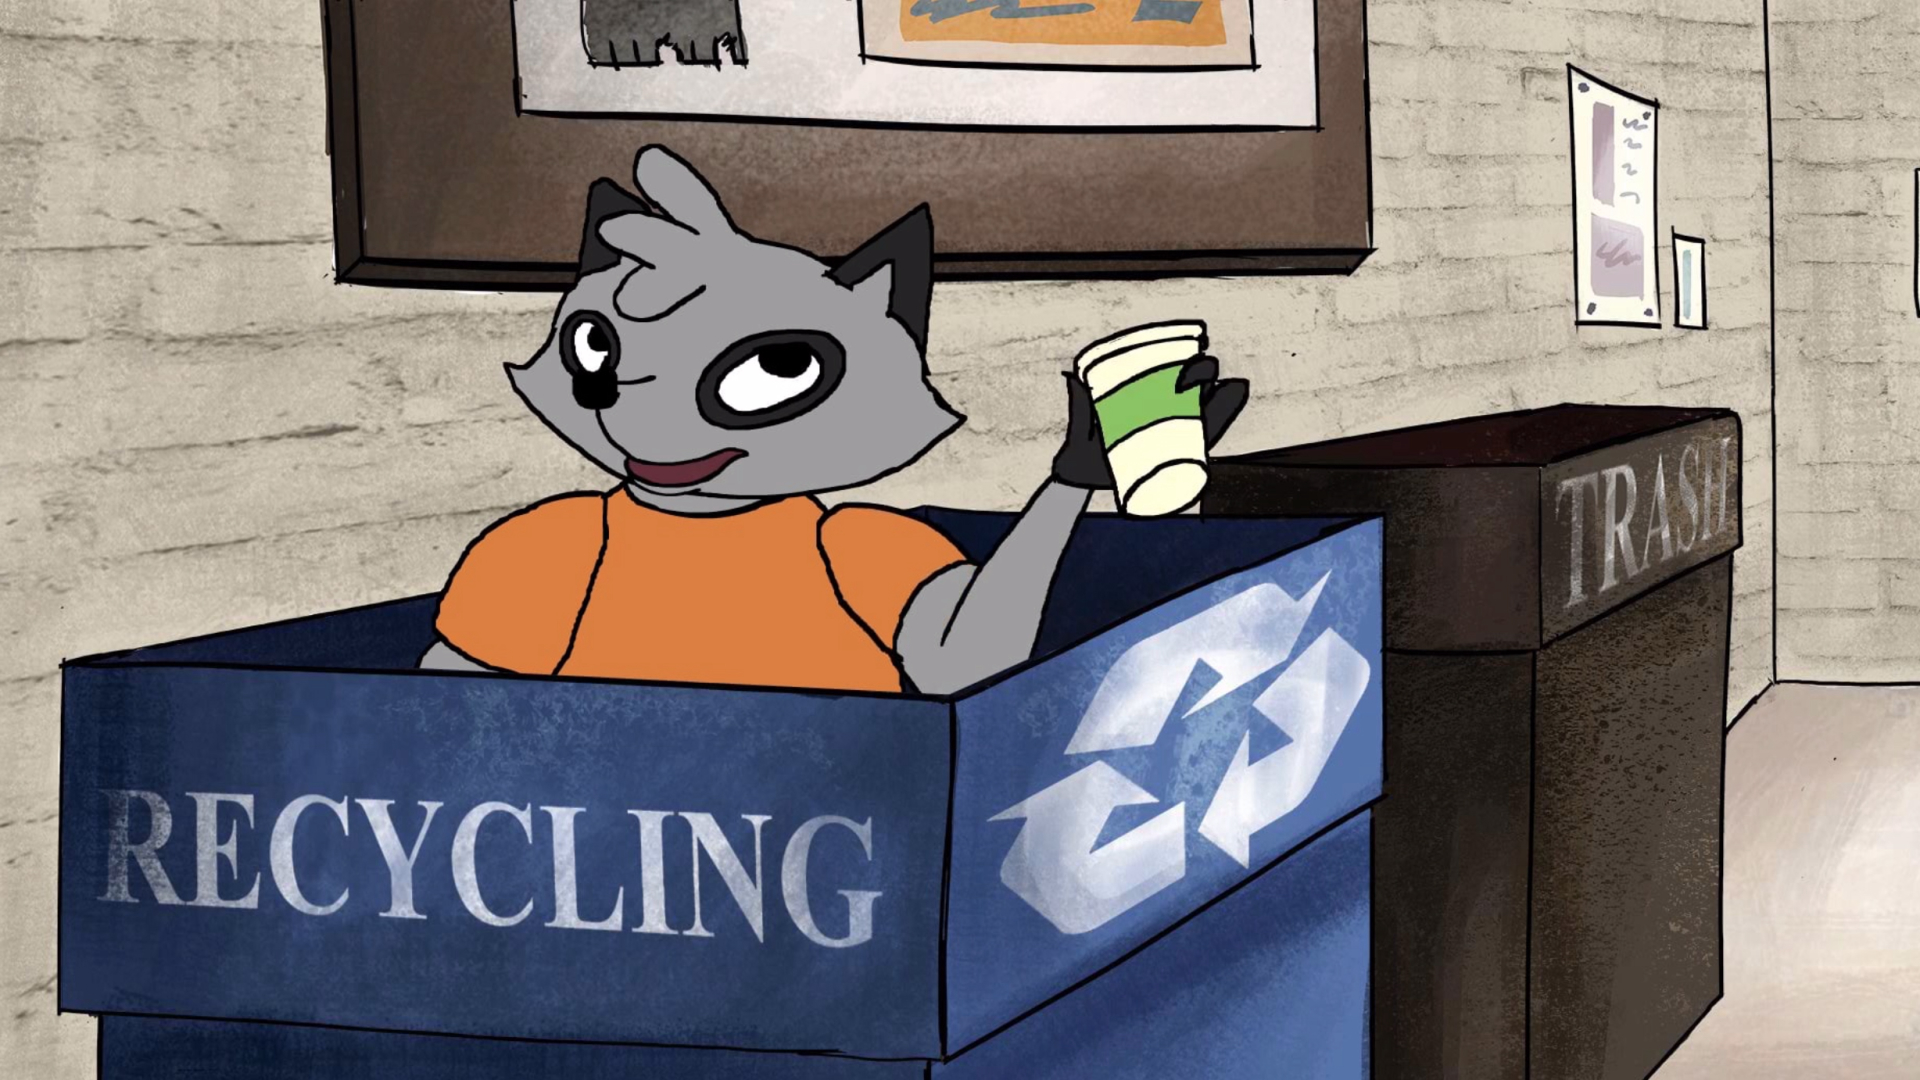 Rylee Barnett, Graham Braaten, Megan Jessie and Allison Lake, Recycle Like Reggie